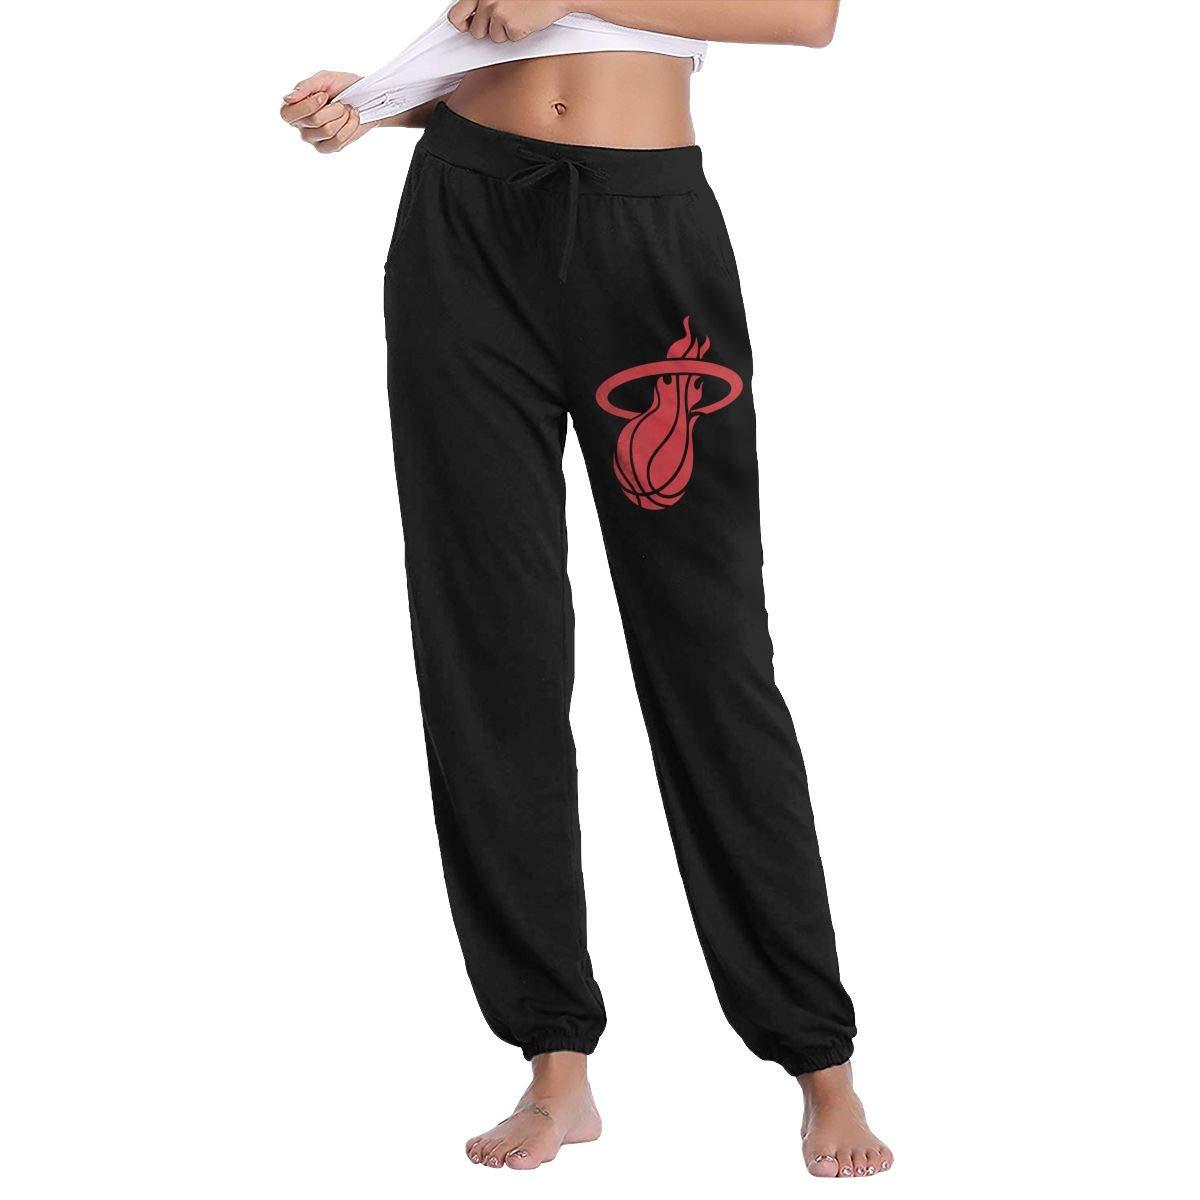 Black L GavDon Women's MiamiHeatLogo Casual Sweatpants Yoga Jogger Lounge Sweat Pants with Pockets